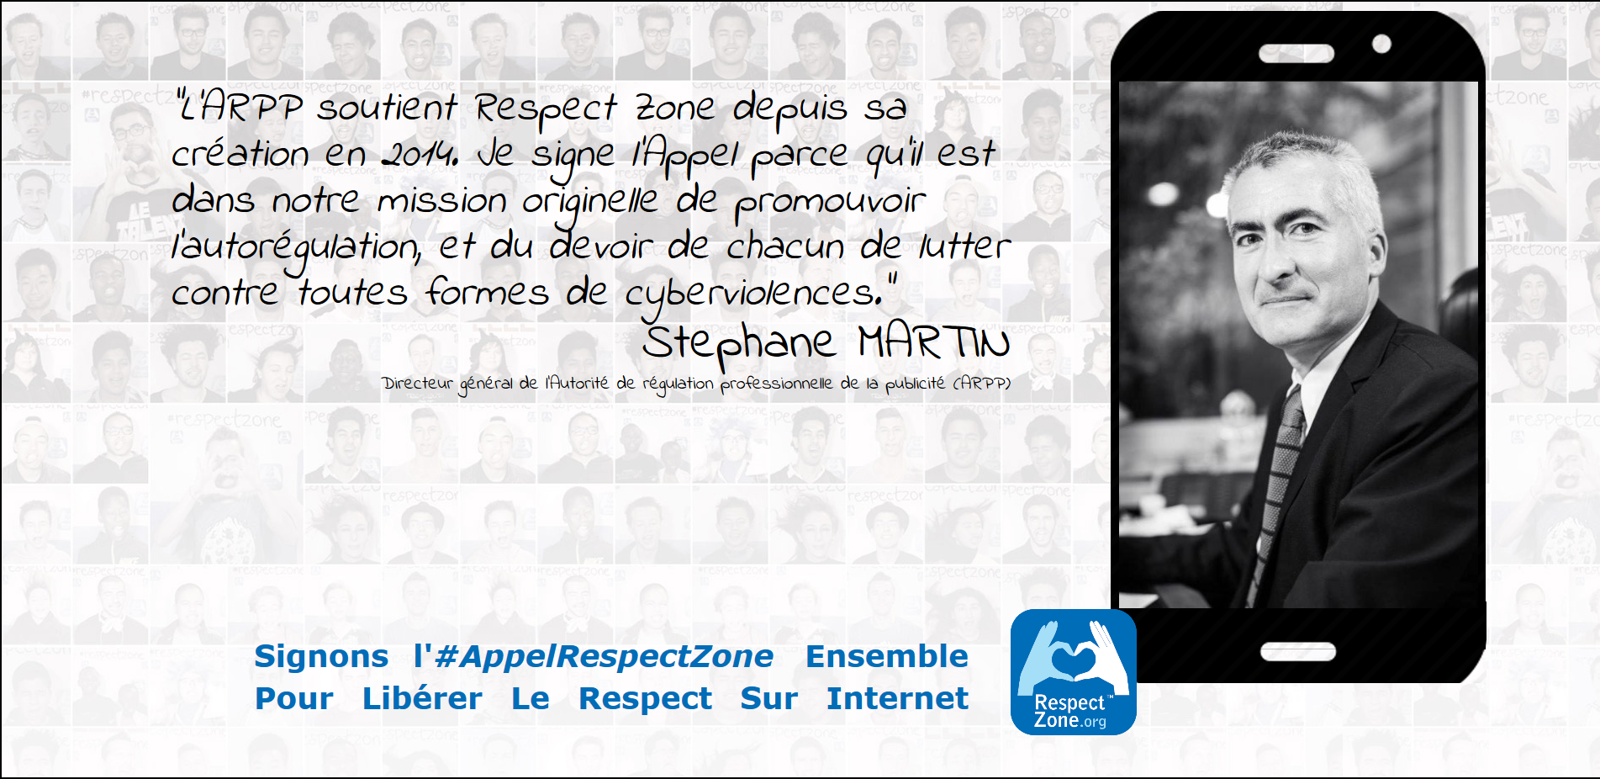 Stephane MARTIN